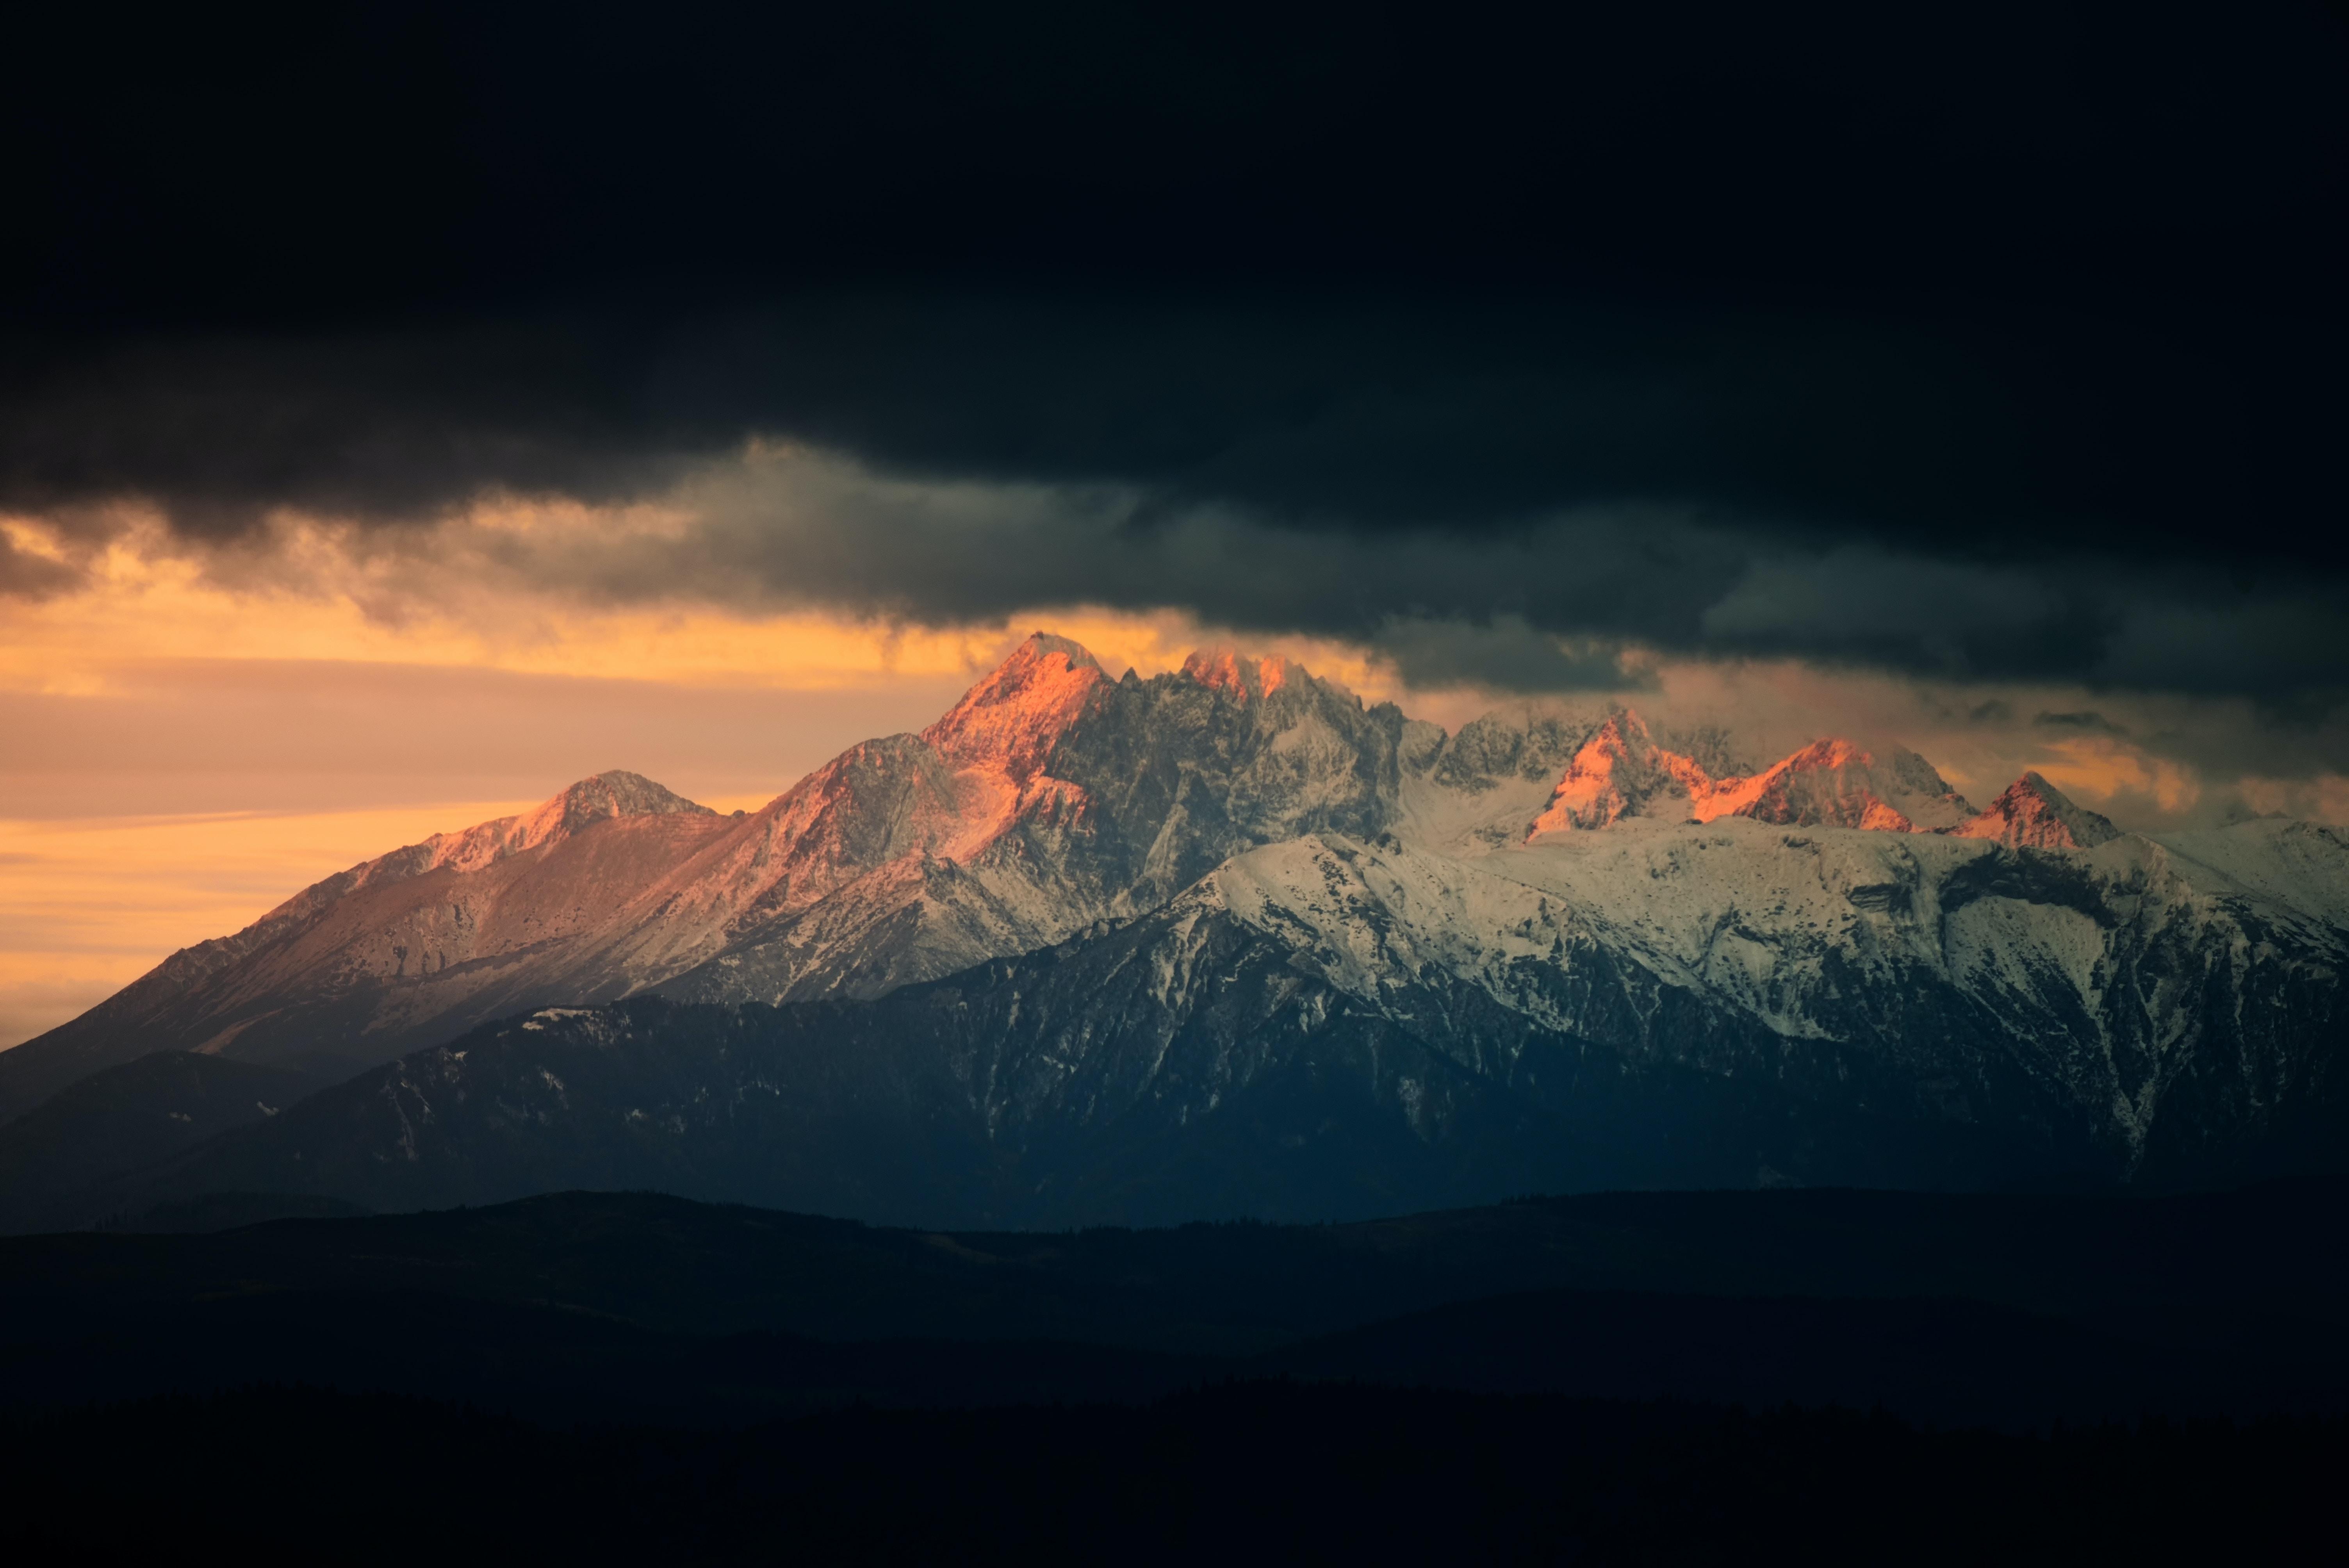 landscape photography of snow mountains under nimbus clouds